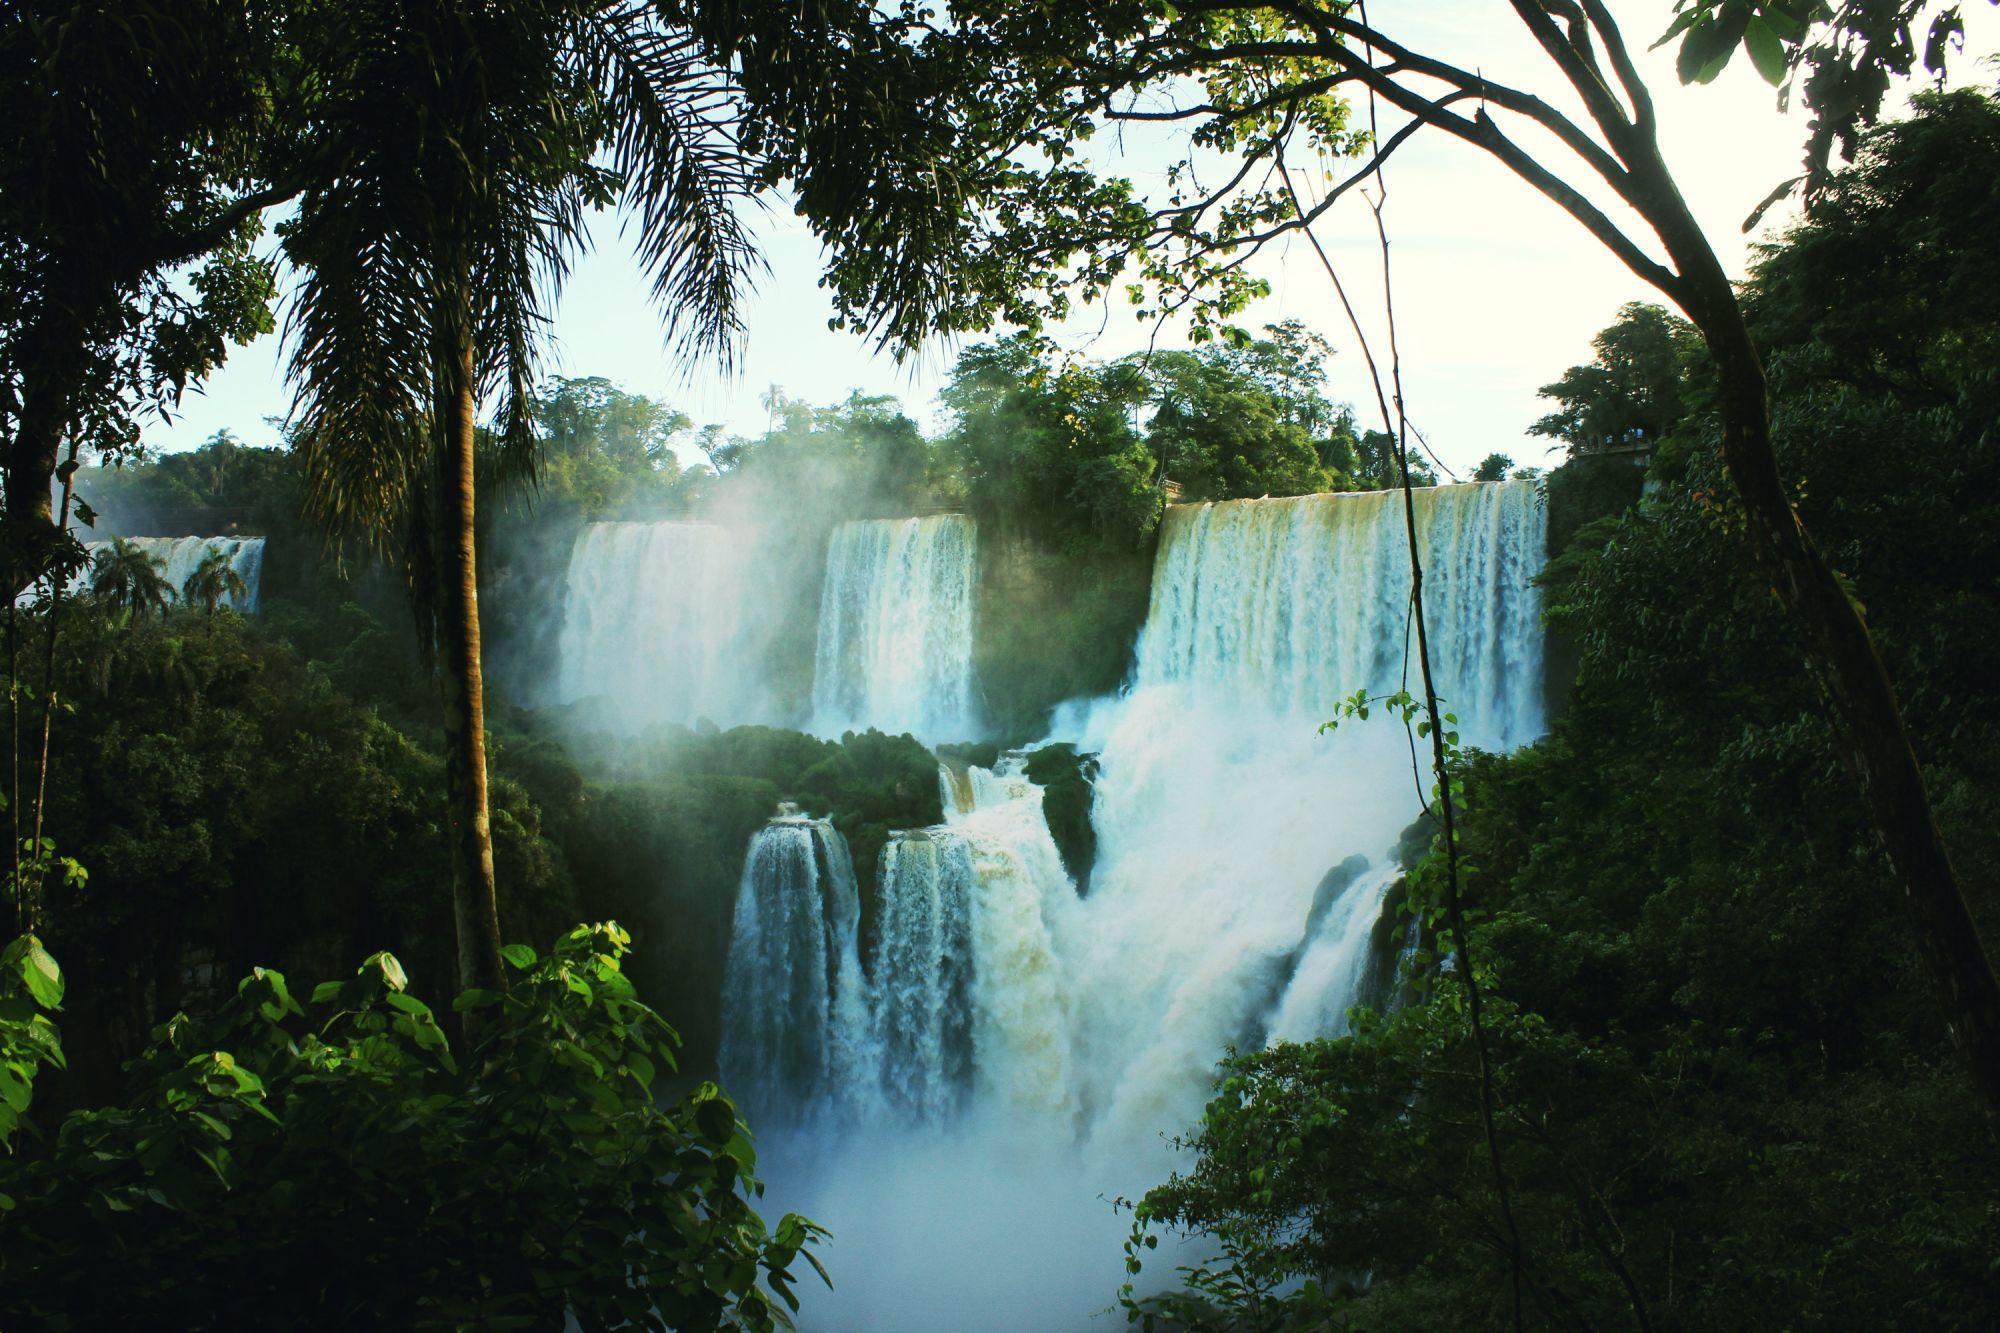 Argentina Signature Tours 2019 - 2020 -  Cascading waterfalls in Iguazu Falls